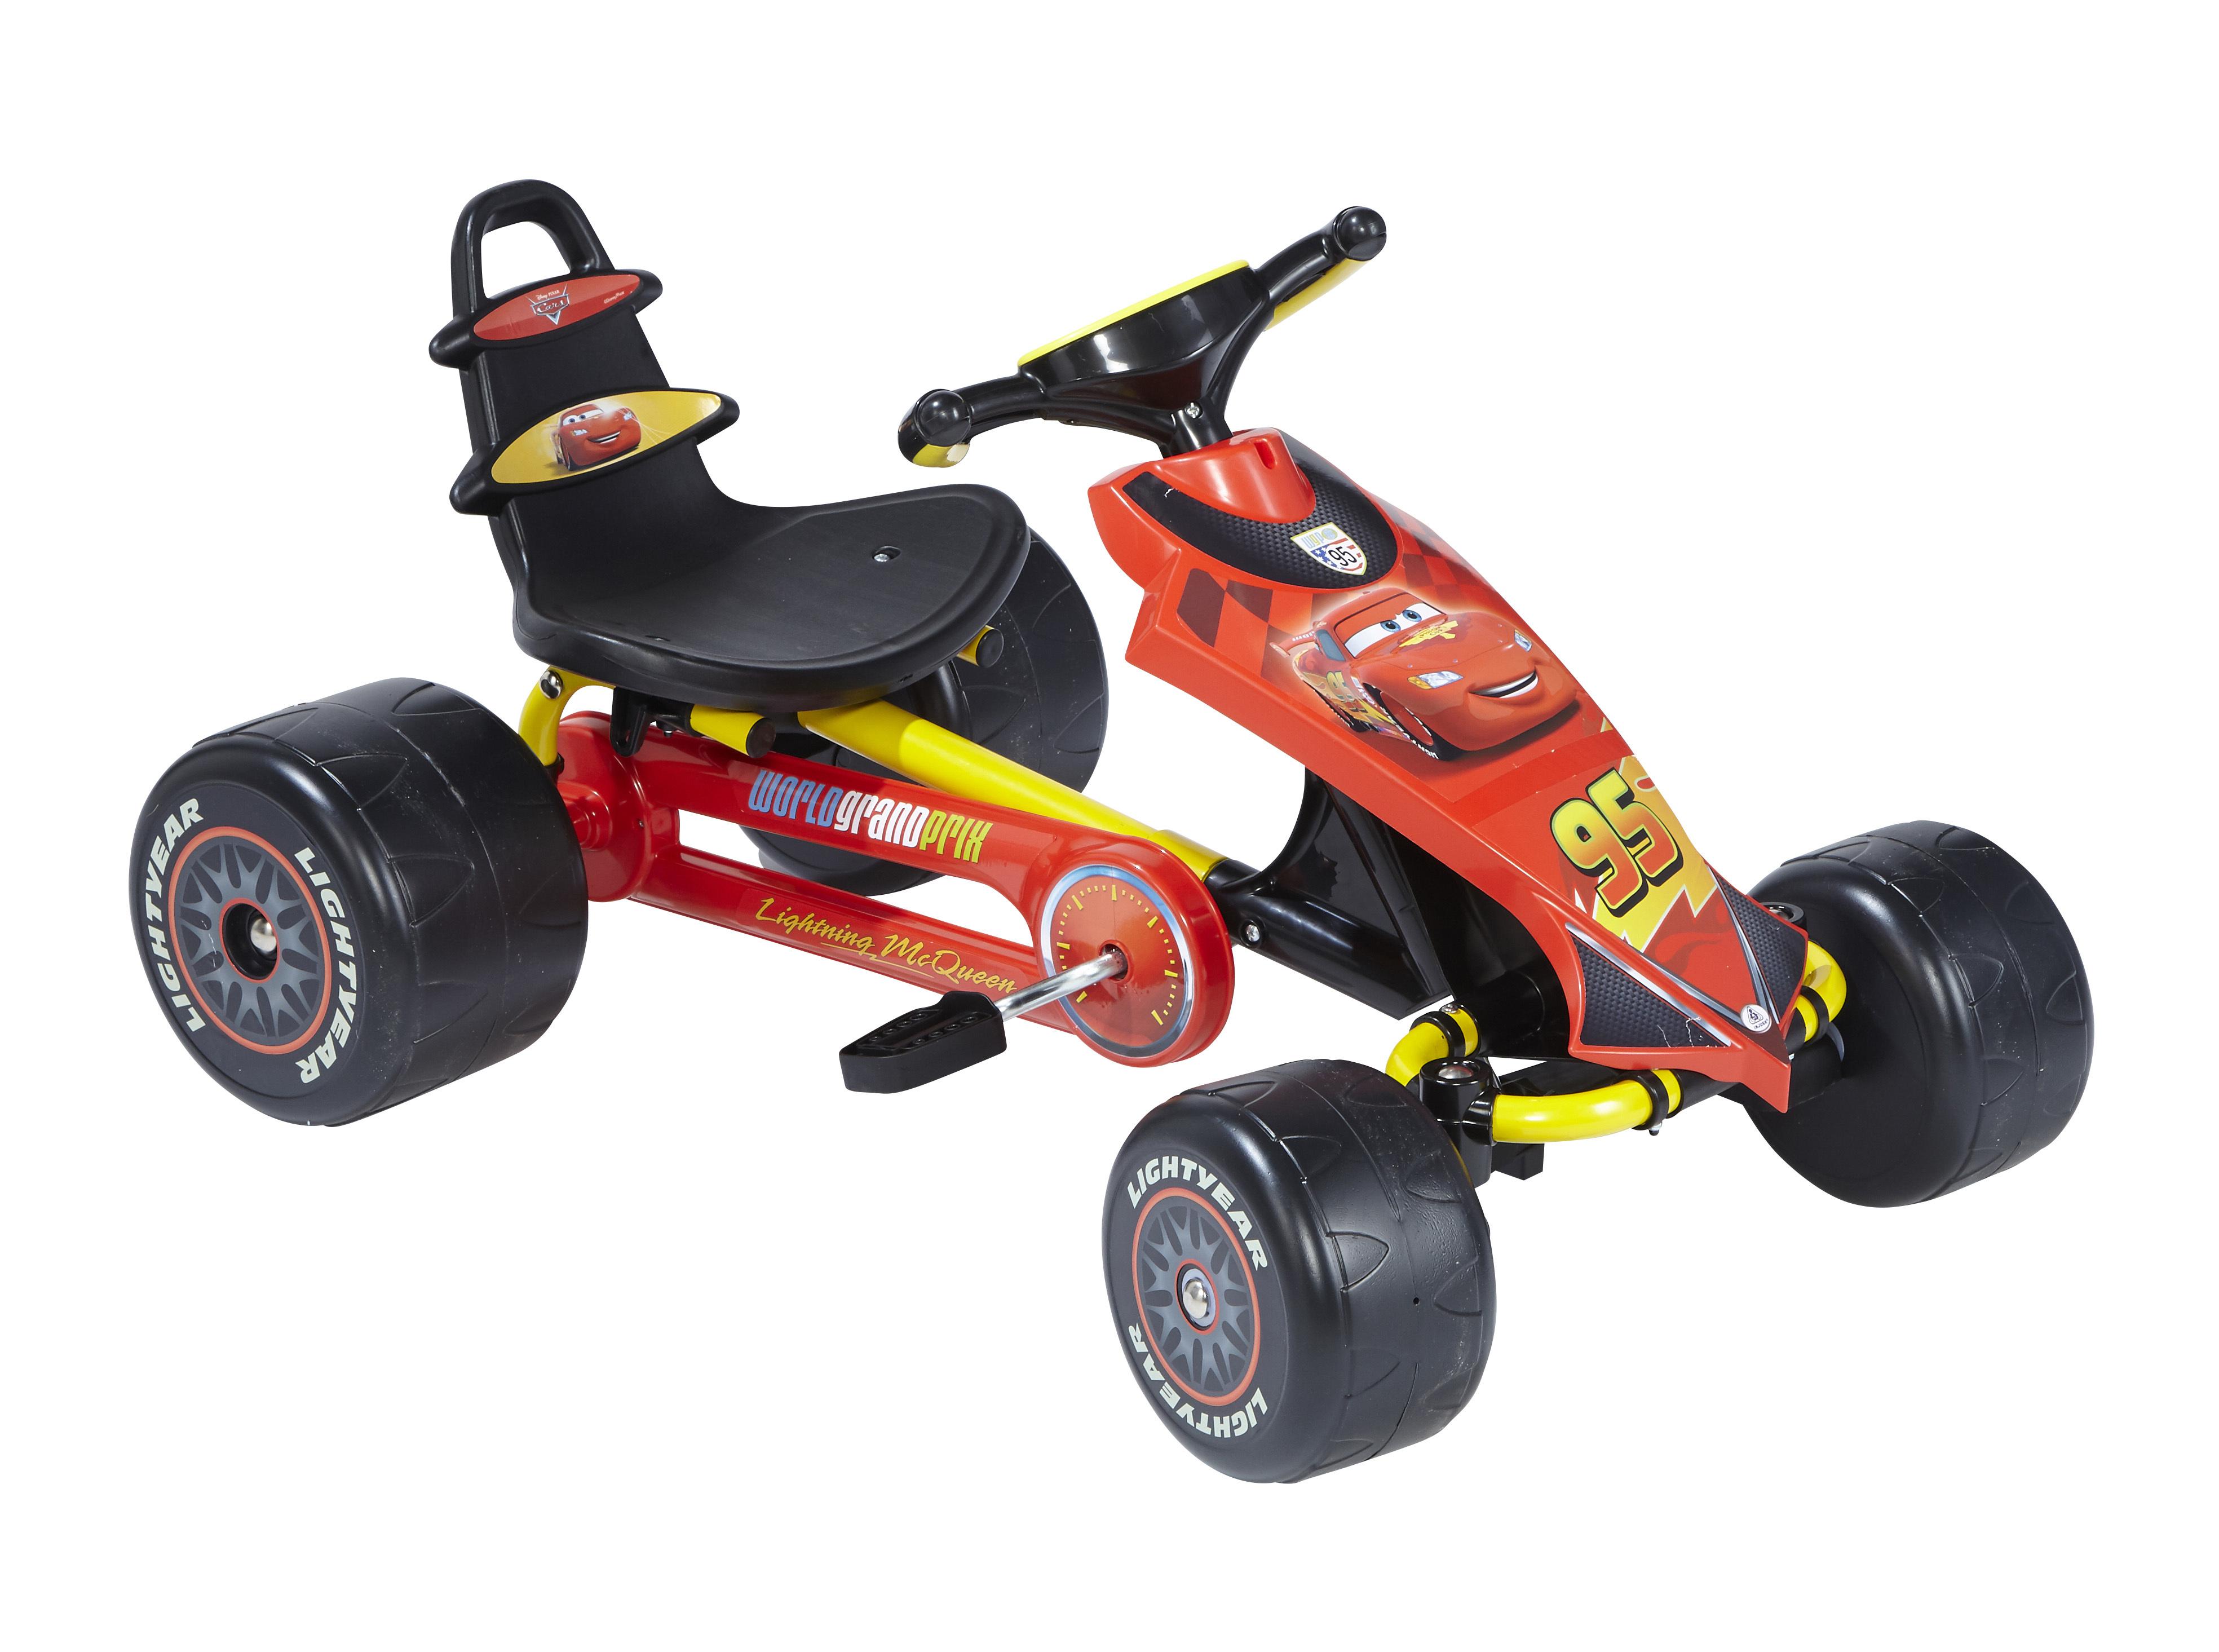 Cars go kart p dales rouge 4125 pas cher achat for Go kart interieur